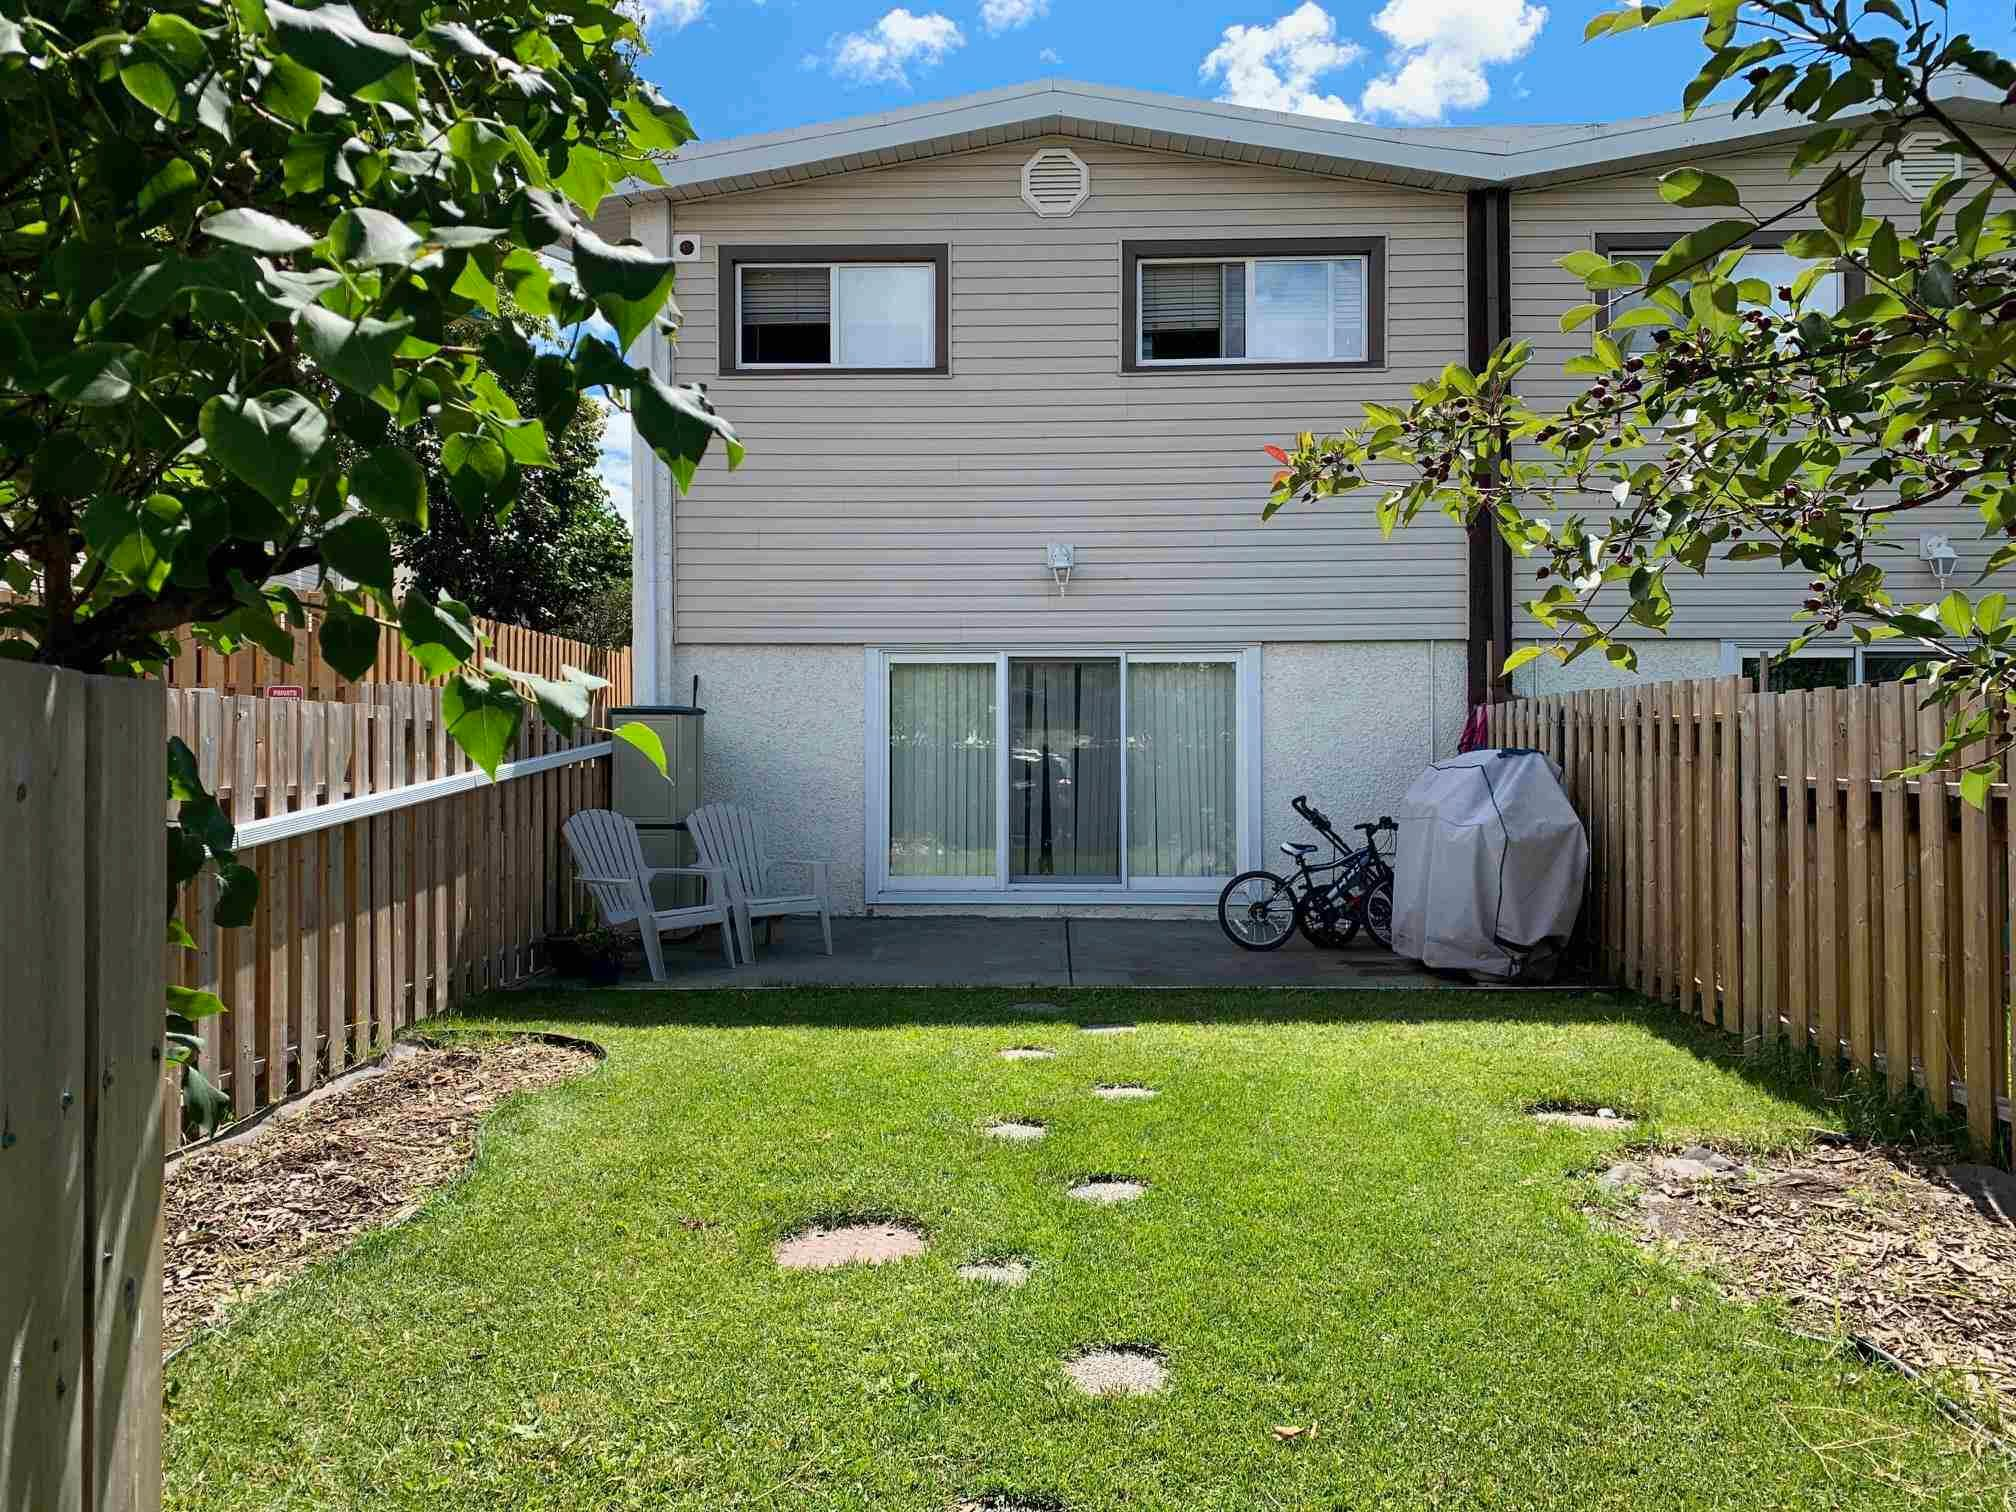 Main Photo: B 16413 89 Avenue in Edmonton: Zone 22 Townhouse for sale : MLS®# E4245994